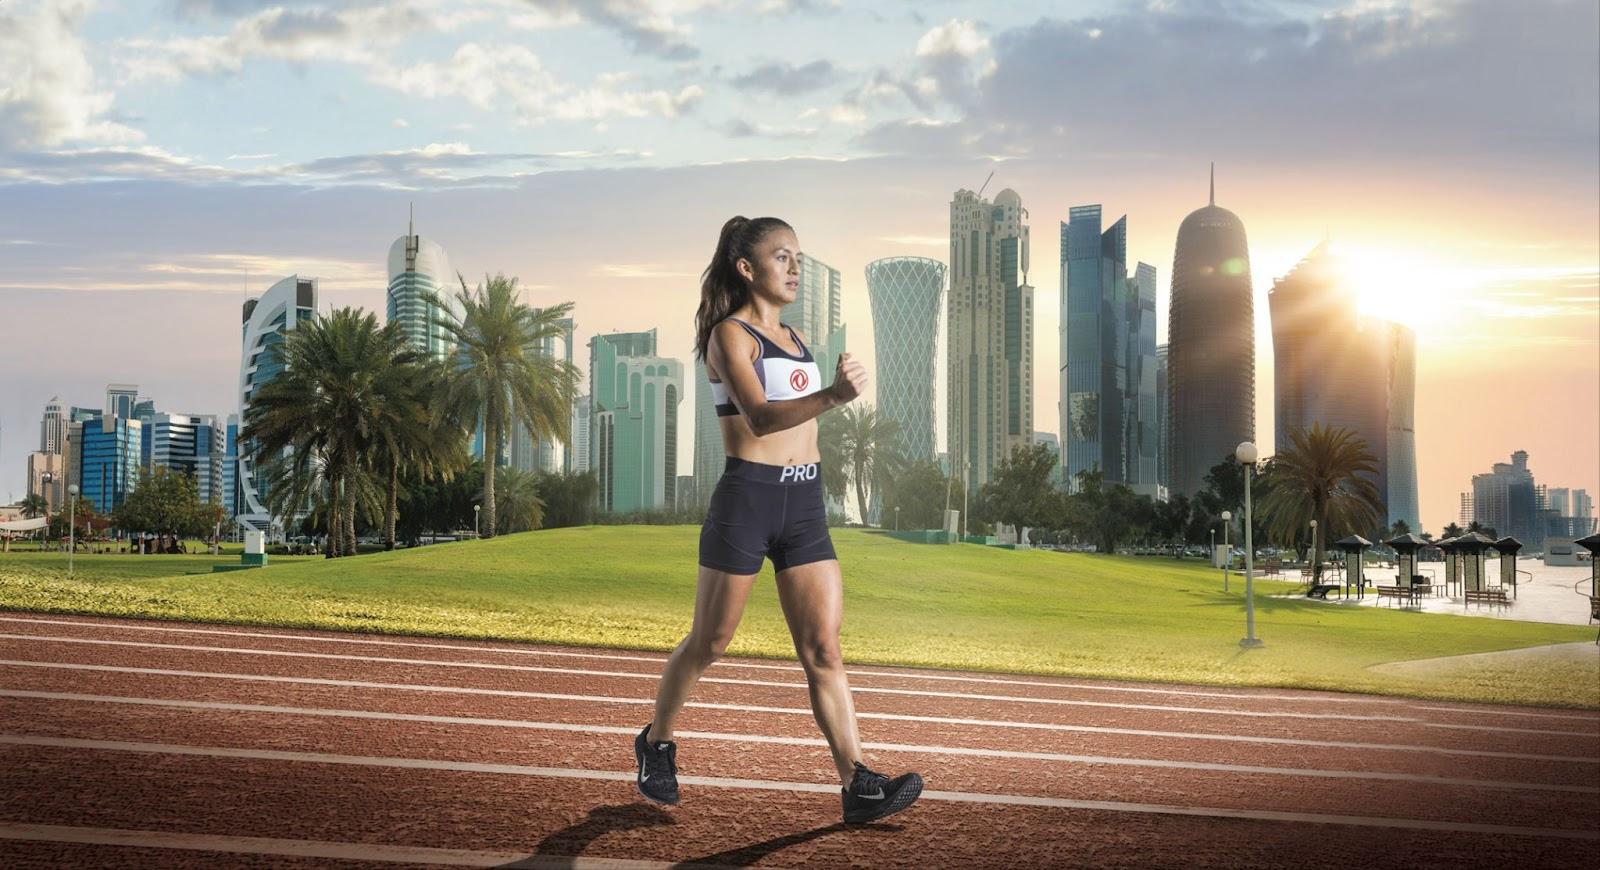 Atletas de 12 países participarán de la Copa Panamericana de Marcha 2021 en Guayaquil